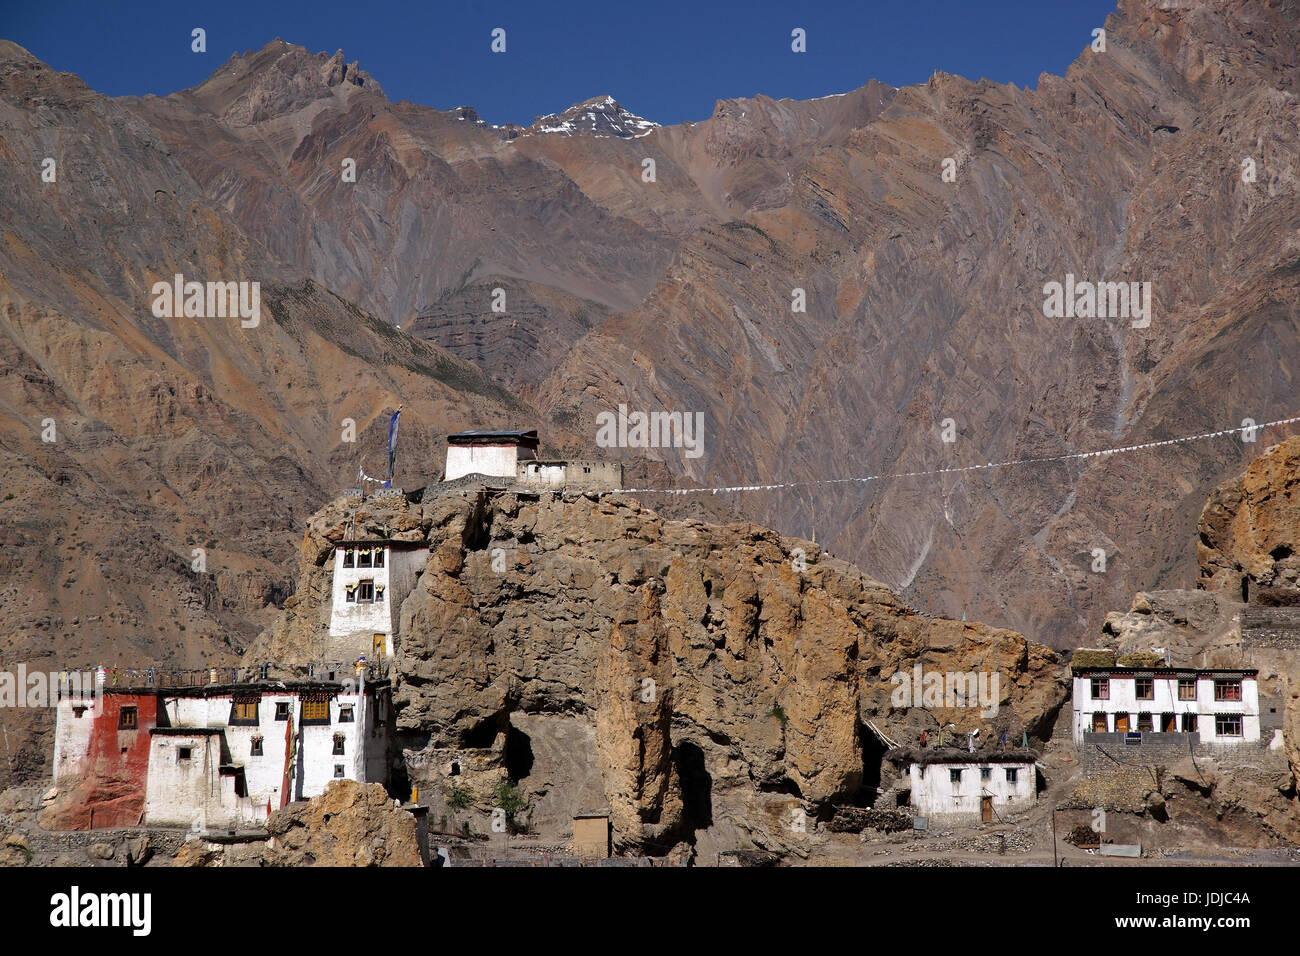 Asien, Indien, Nord-Indien, Kreuzgang des Dankar in Spiti, Asien, Indien, Nordindien, Kloster Dankar in Spiti, Stockbild